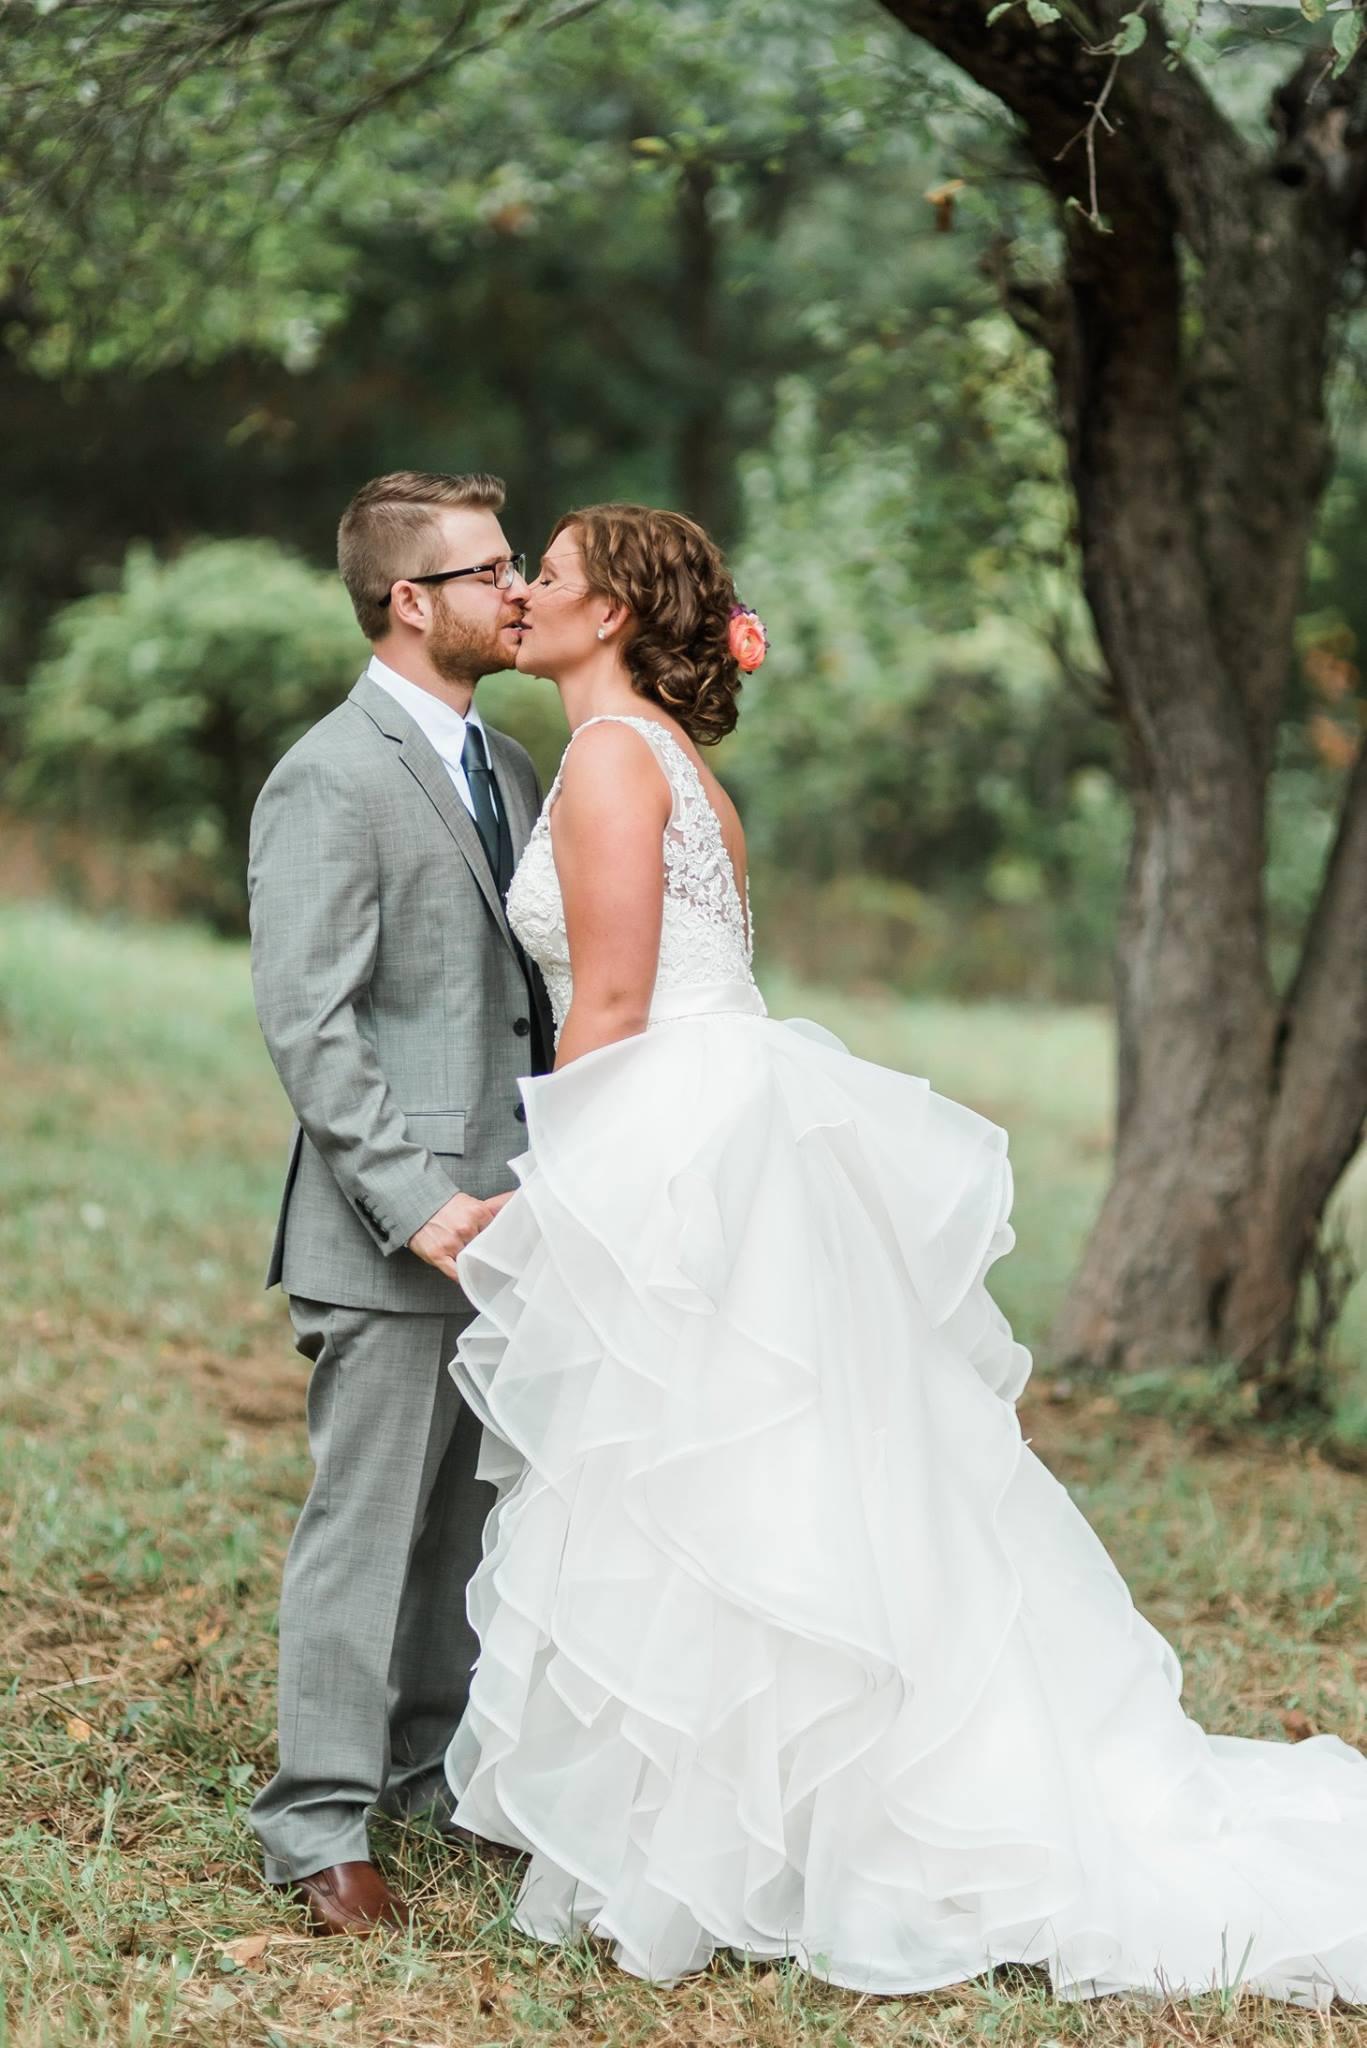 pennsylvania-backyard-wedding-love-diy-bohemian-romantic-colorful-0012.jpg